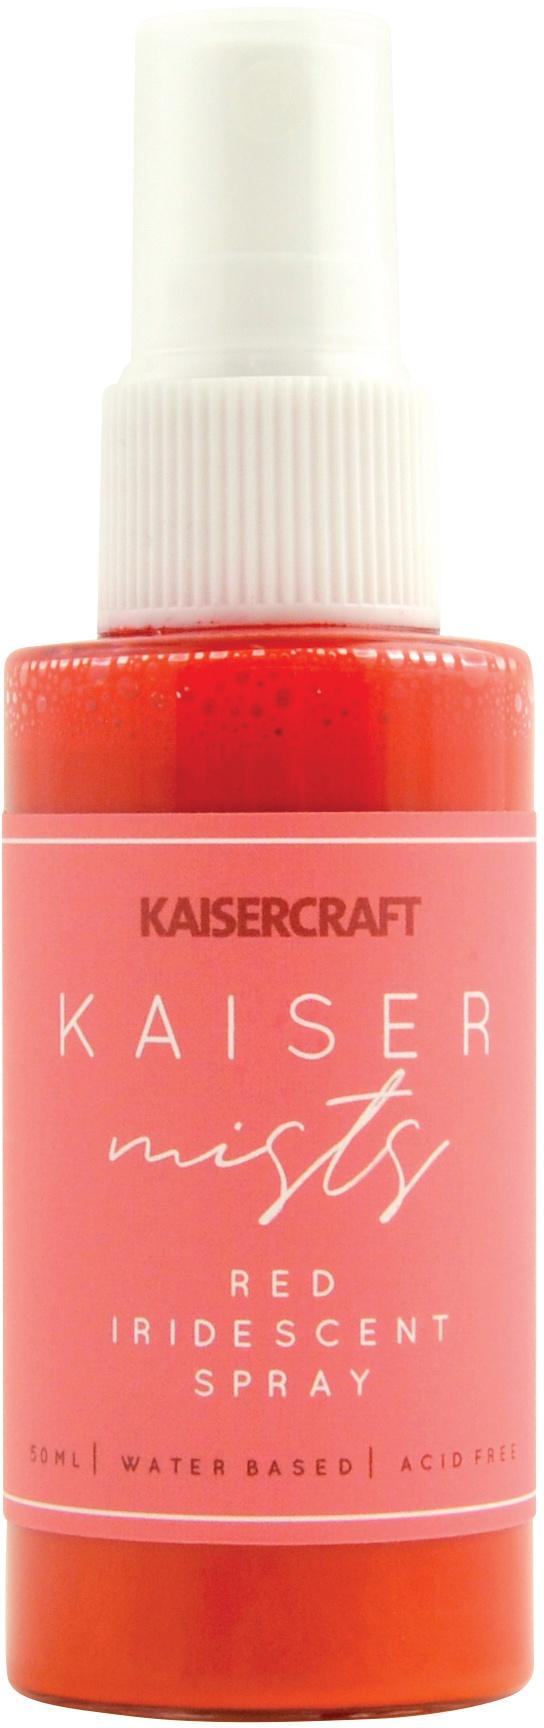 KaiserMists Iridescent Ink Spray 1.5oz-Red